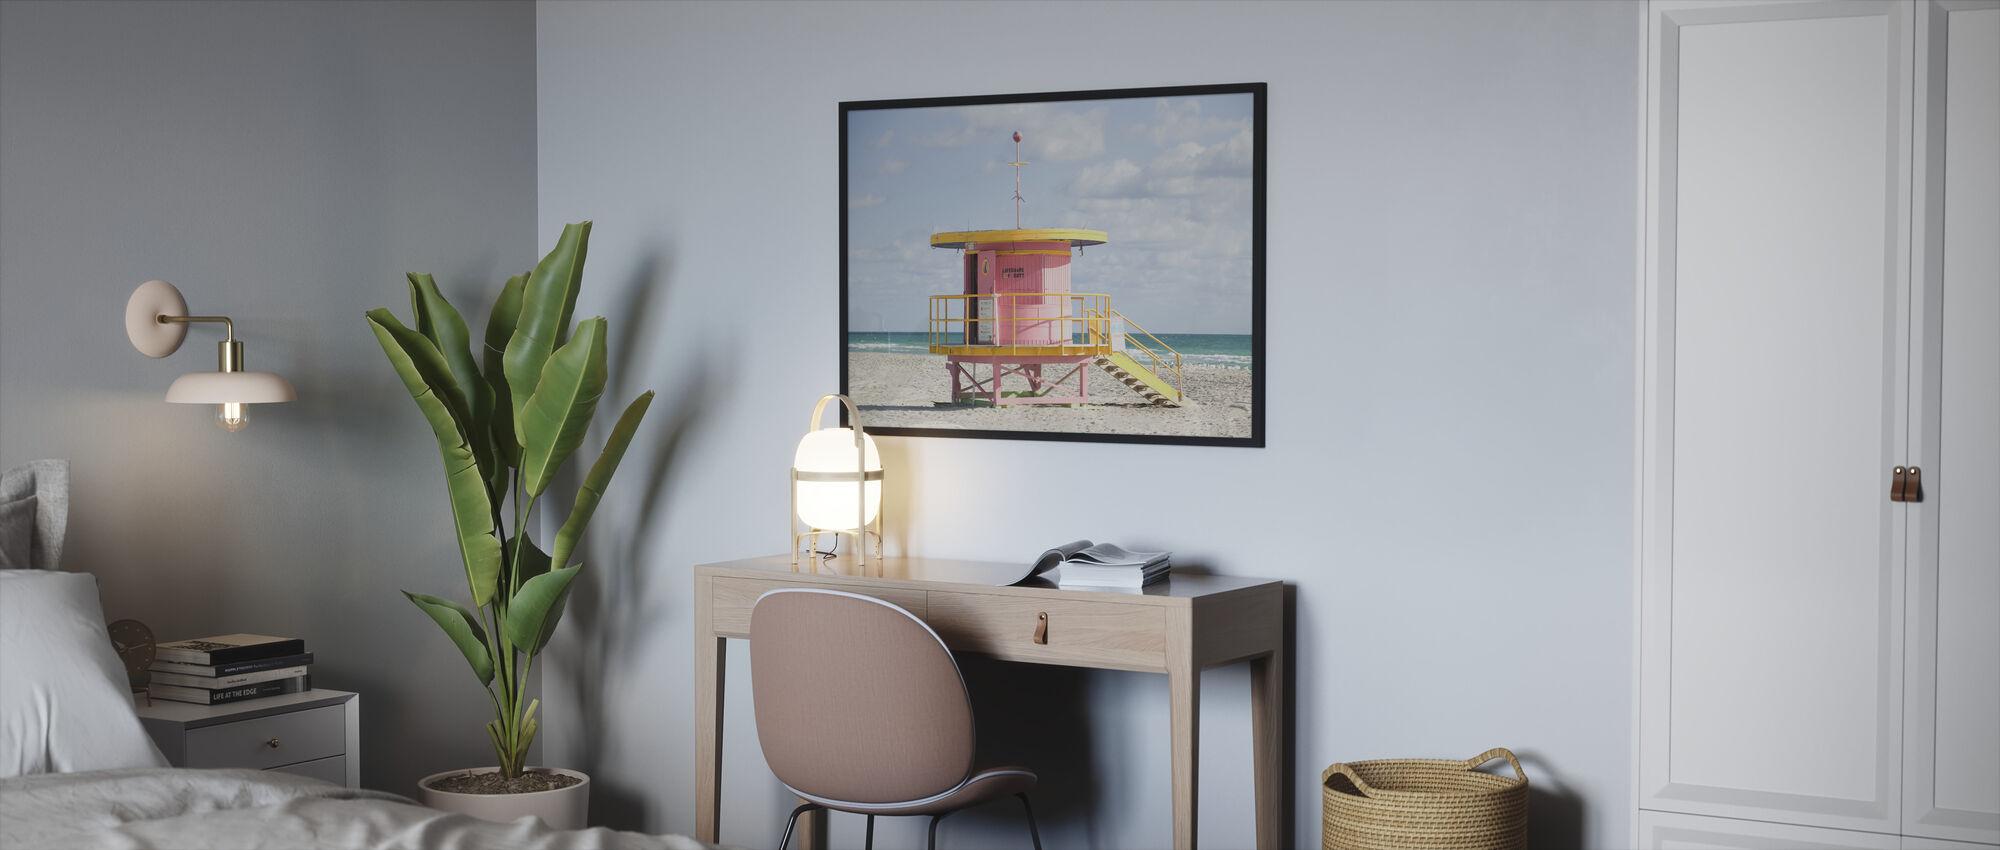 Tårnet i Miami, USA - Innrammet bilde - Soverom